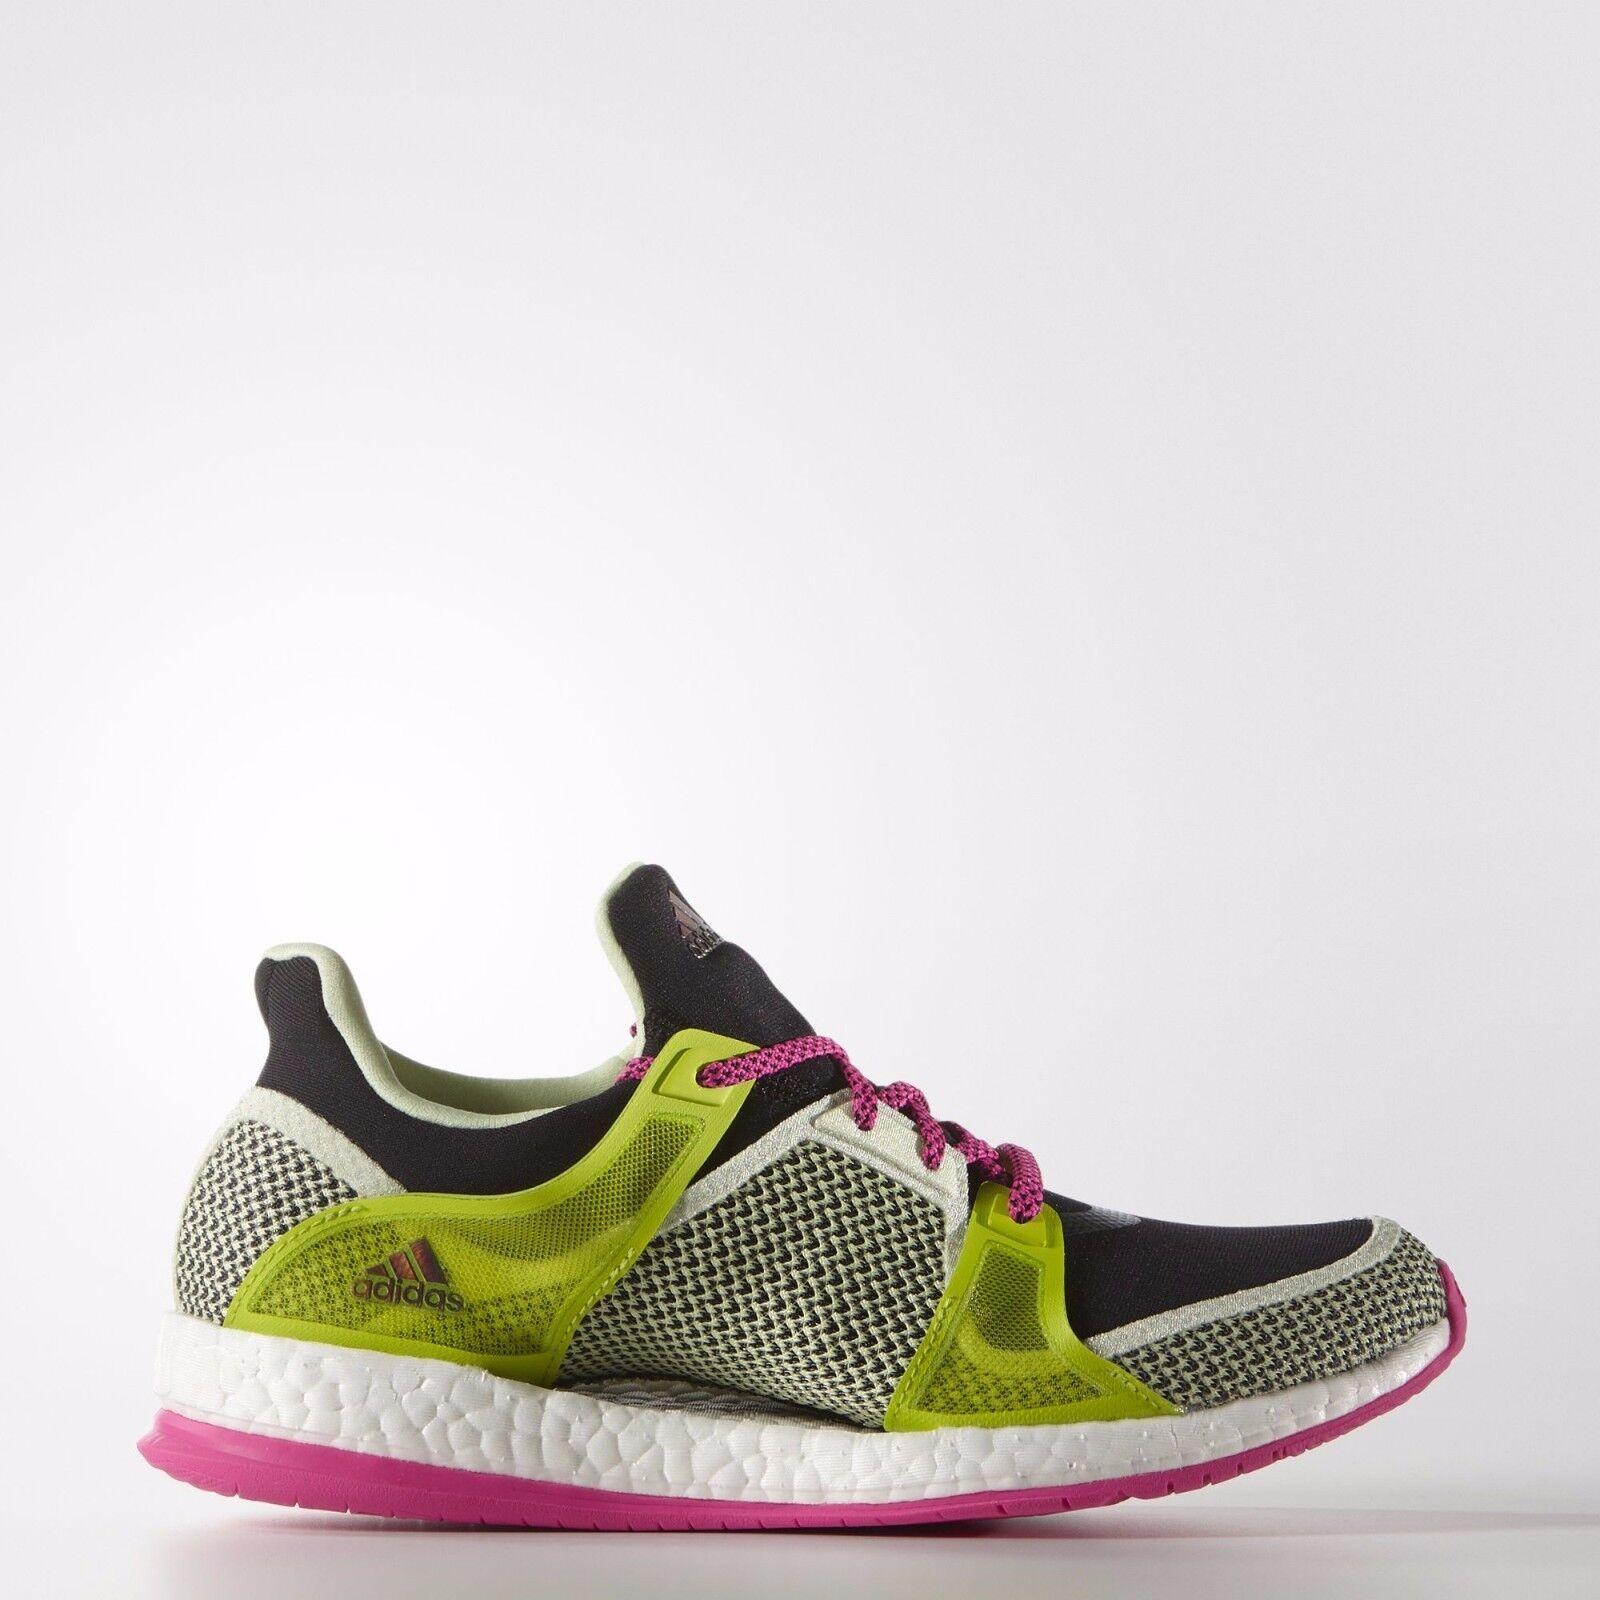 Adidas Pure Boost X Training AQ5221 Femme Running Limited Edition